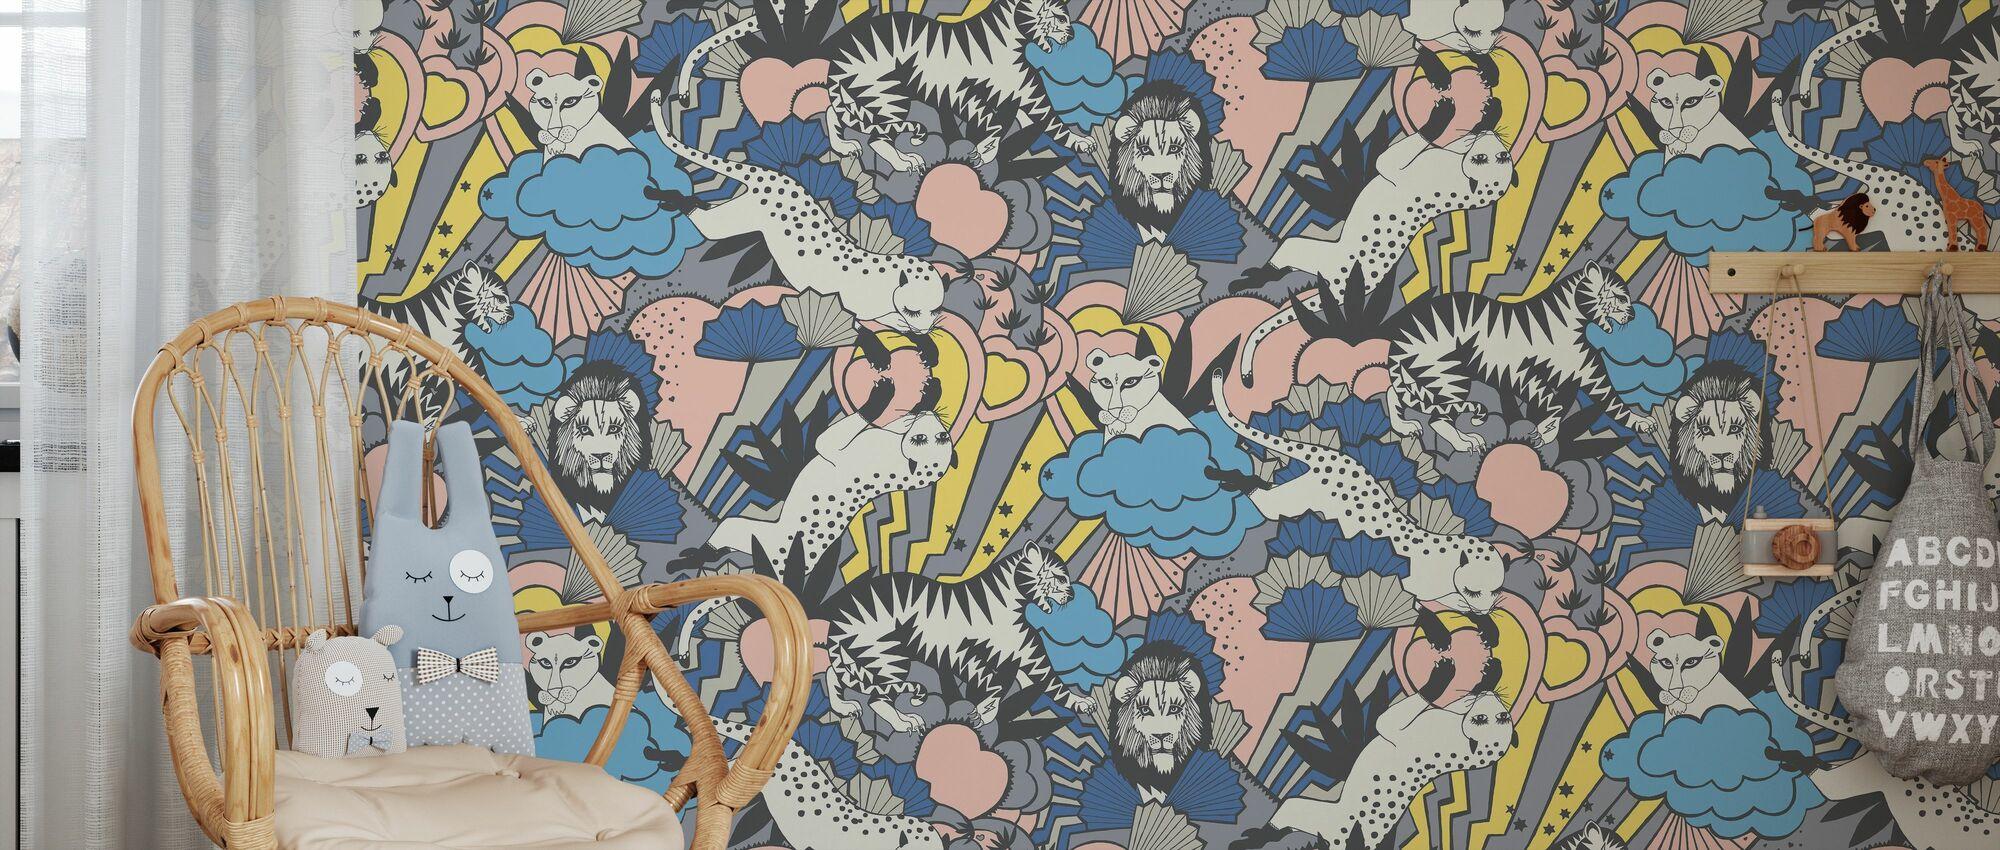 Jungle Love - Wallpaper - Kids Room